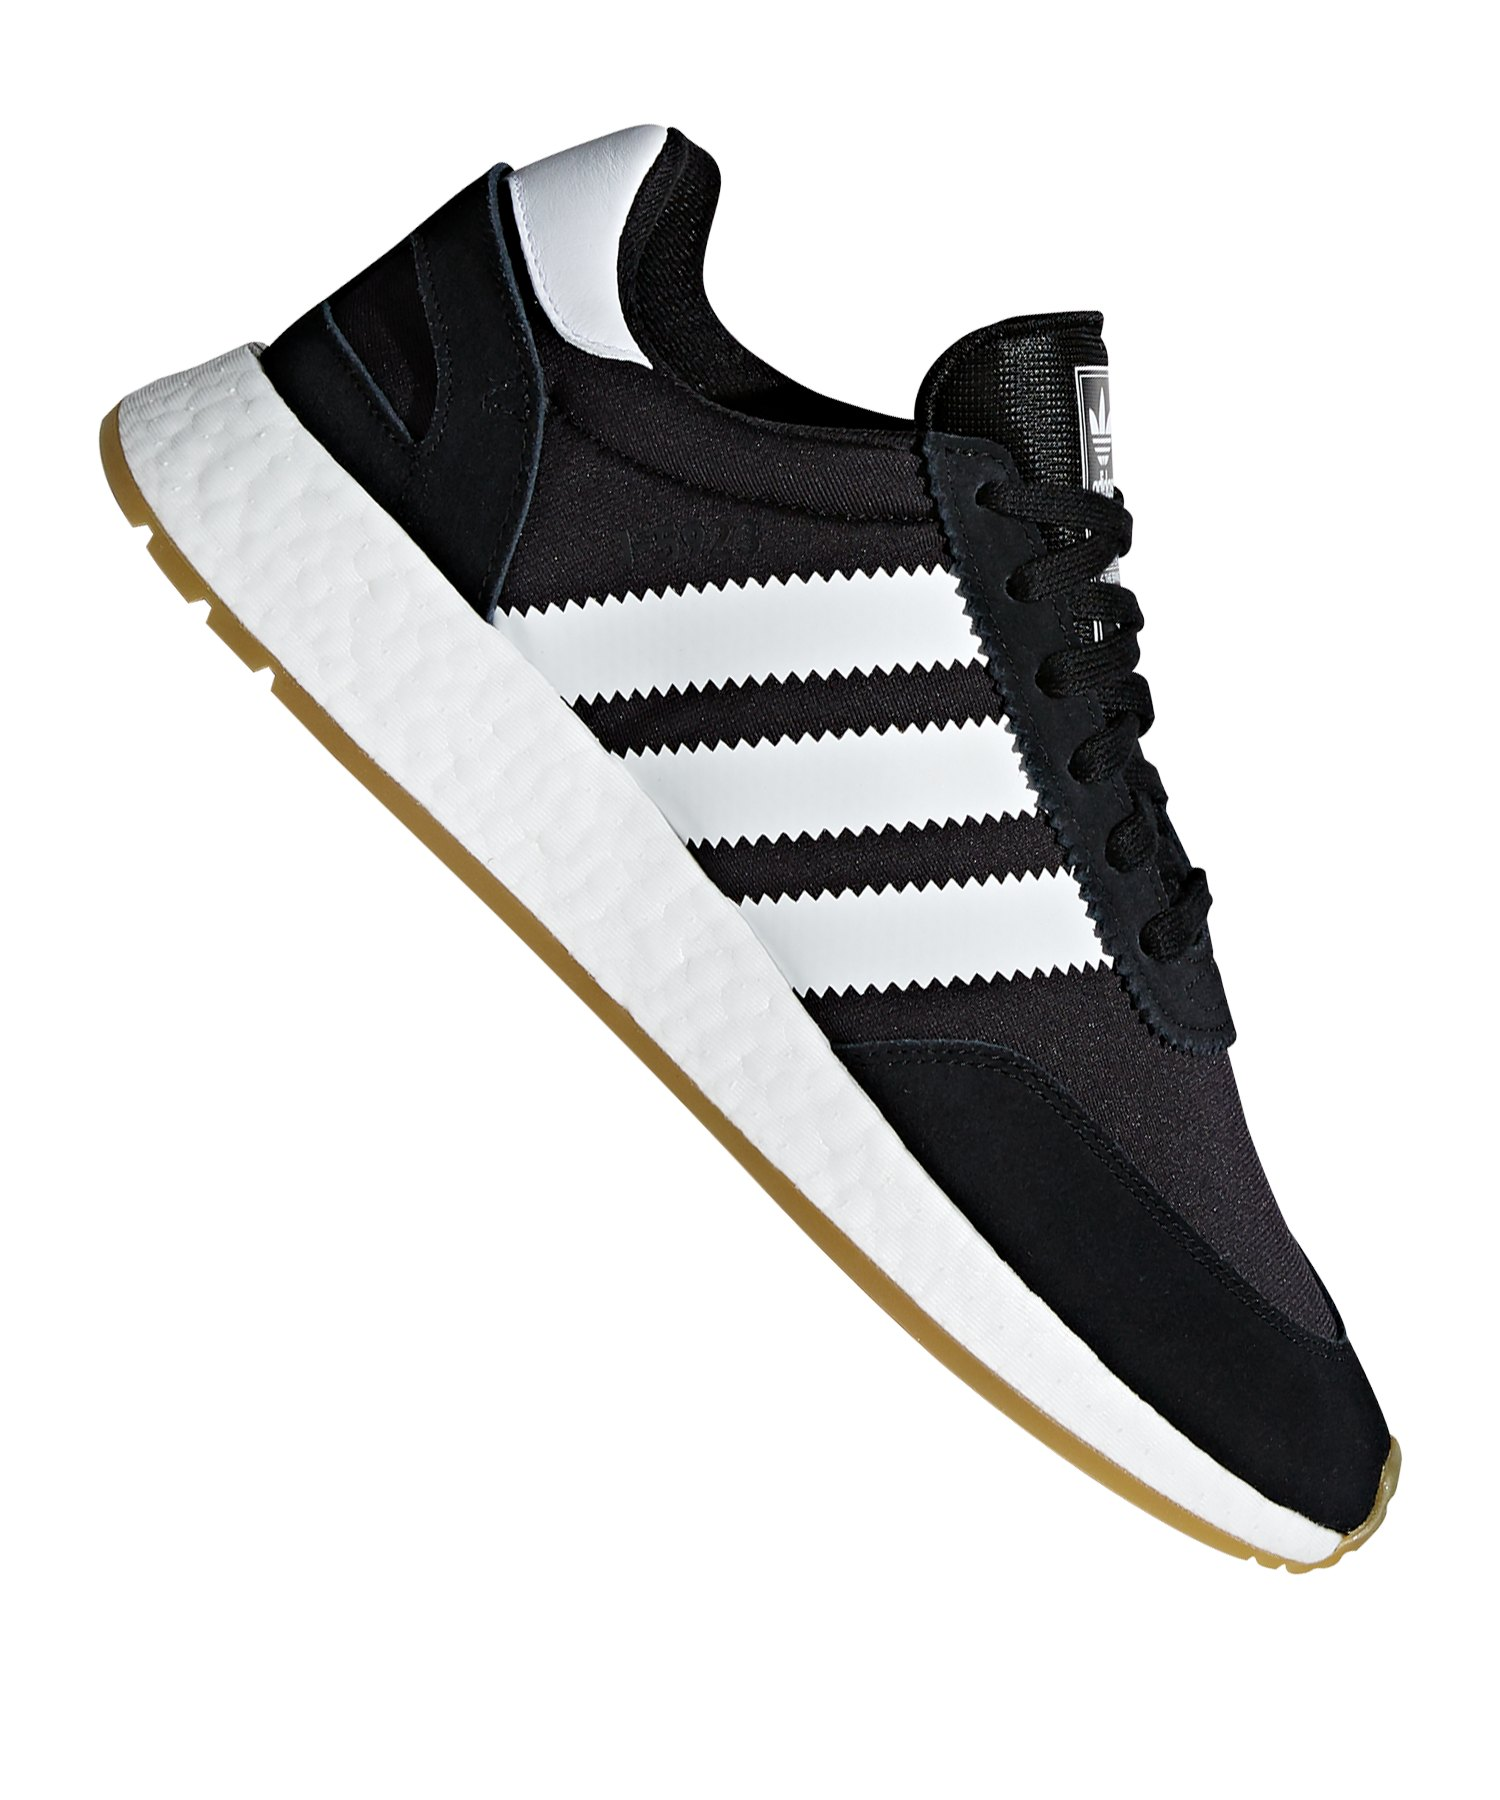 adidas I 5923 Schuhe braun im WeAre Shop